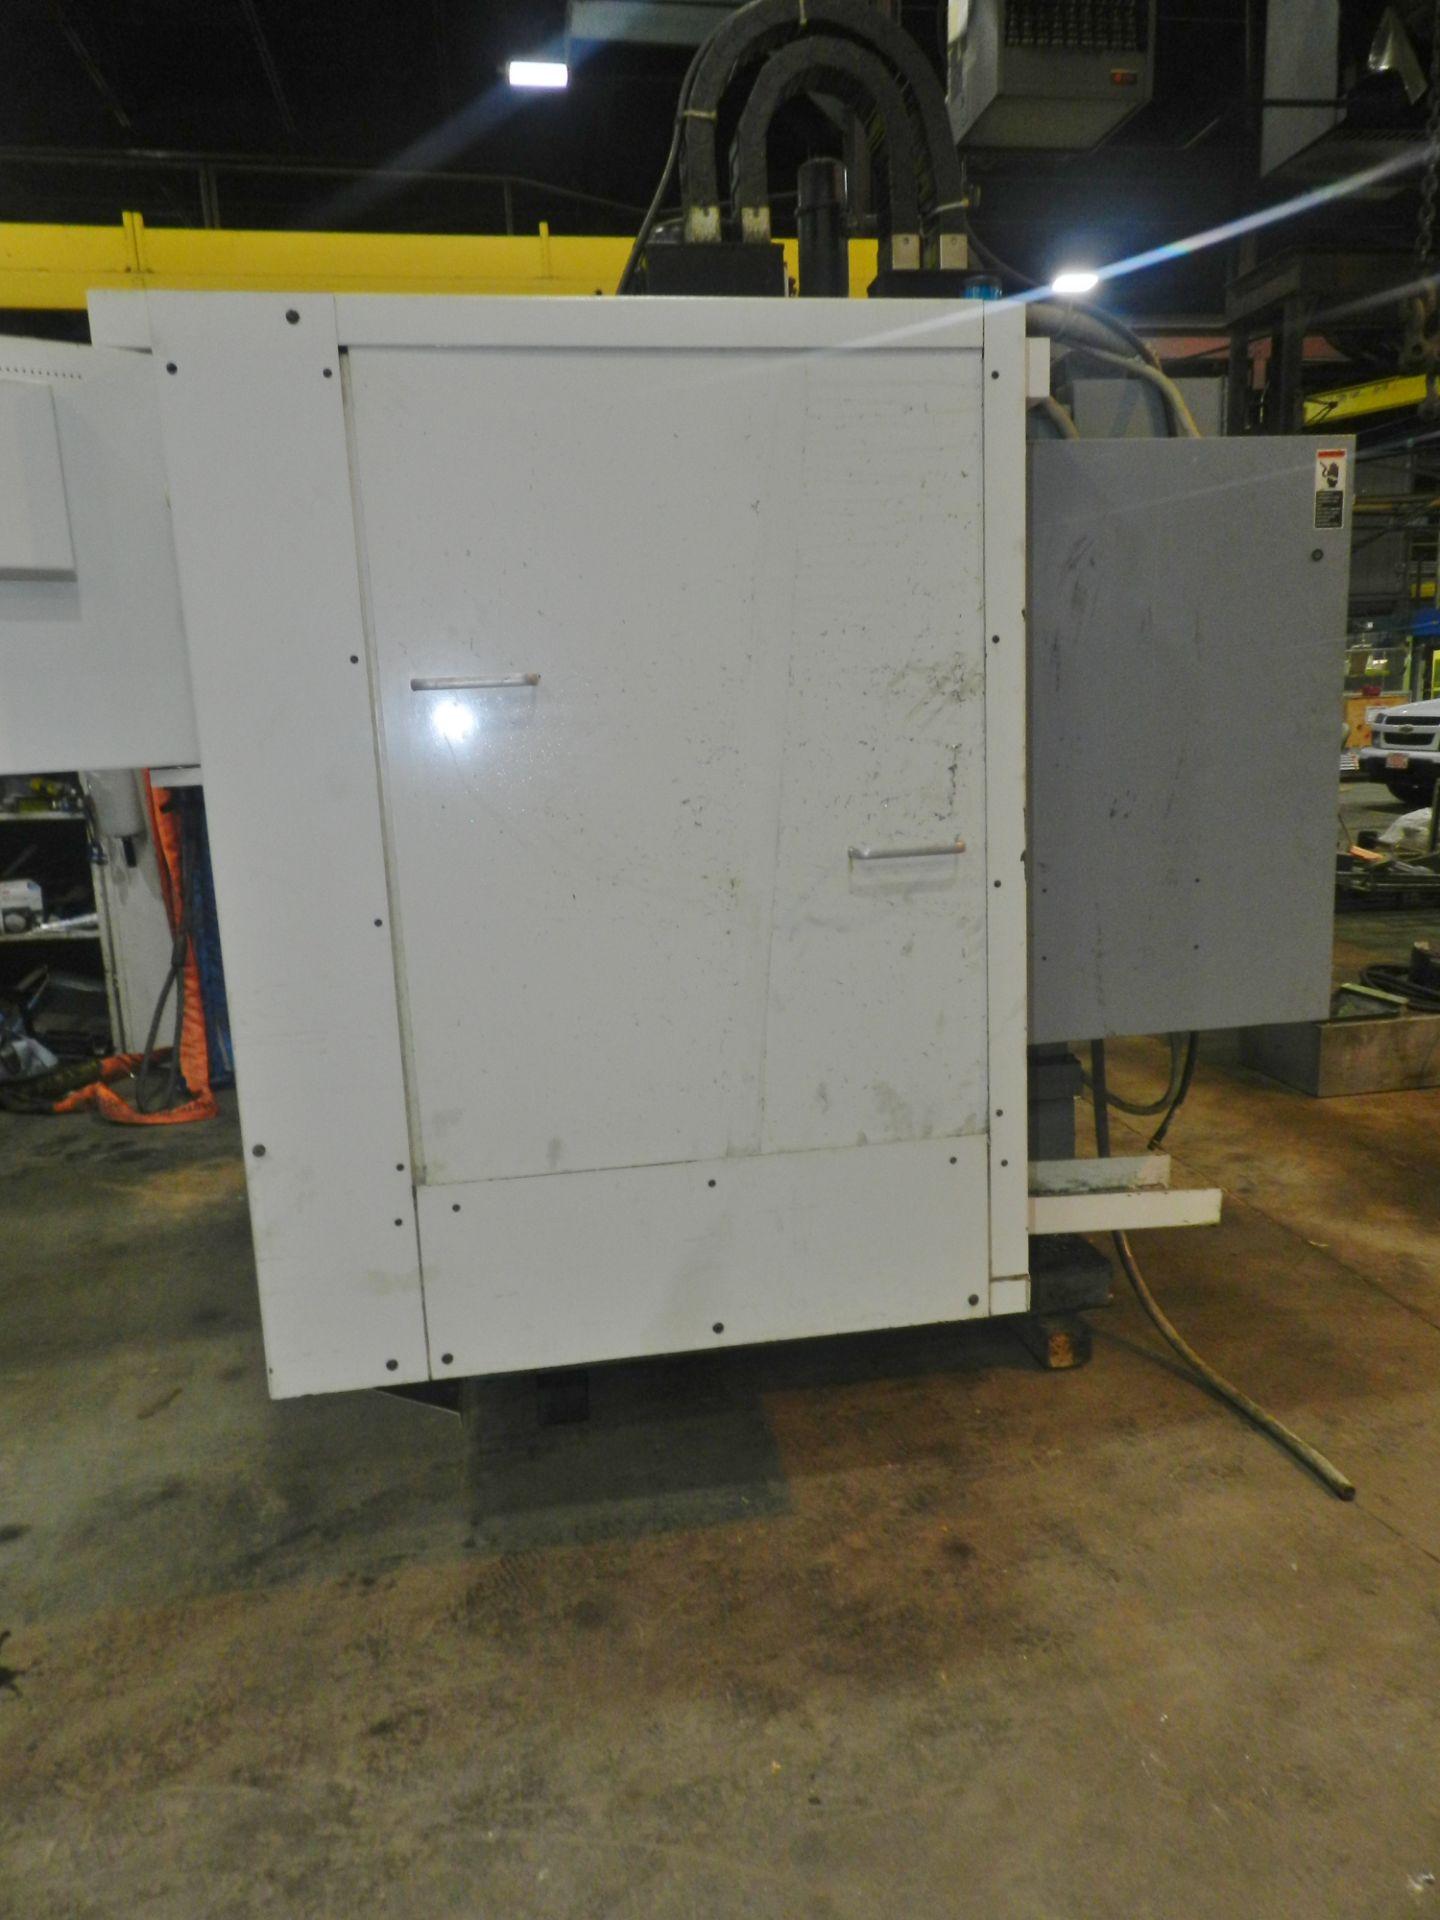 Lot 29 - Fadal 914-15 VMC 15 CNC Vertical Machining Center